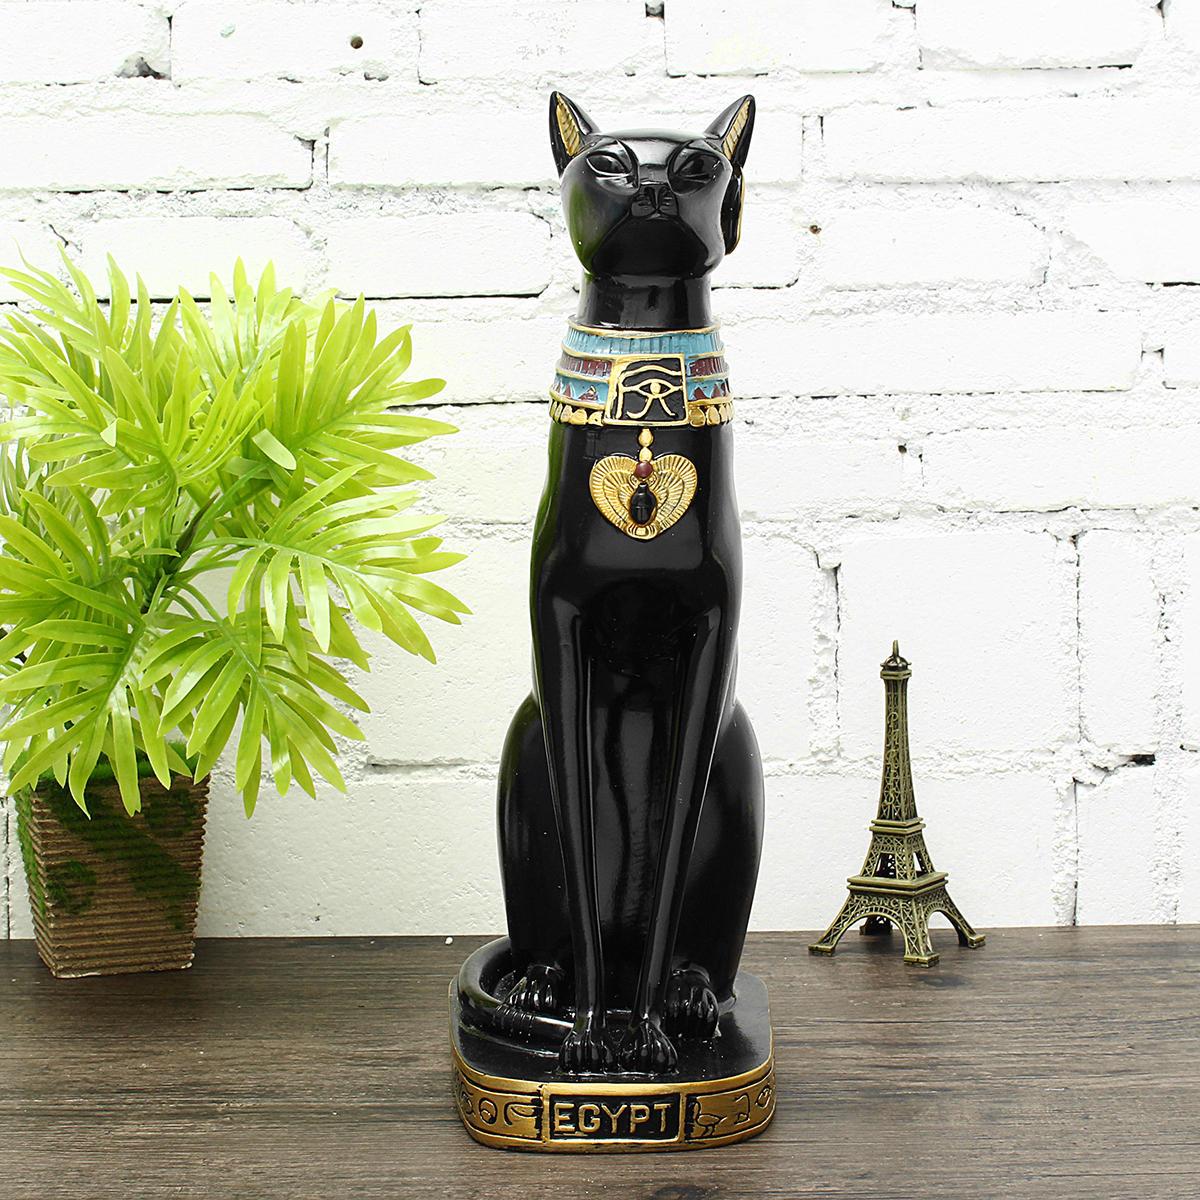 15'' Vintage Egyptian Bastet Cat Goddess Resin Figurine Black Cat Pharaoh Statue Decorations